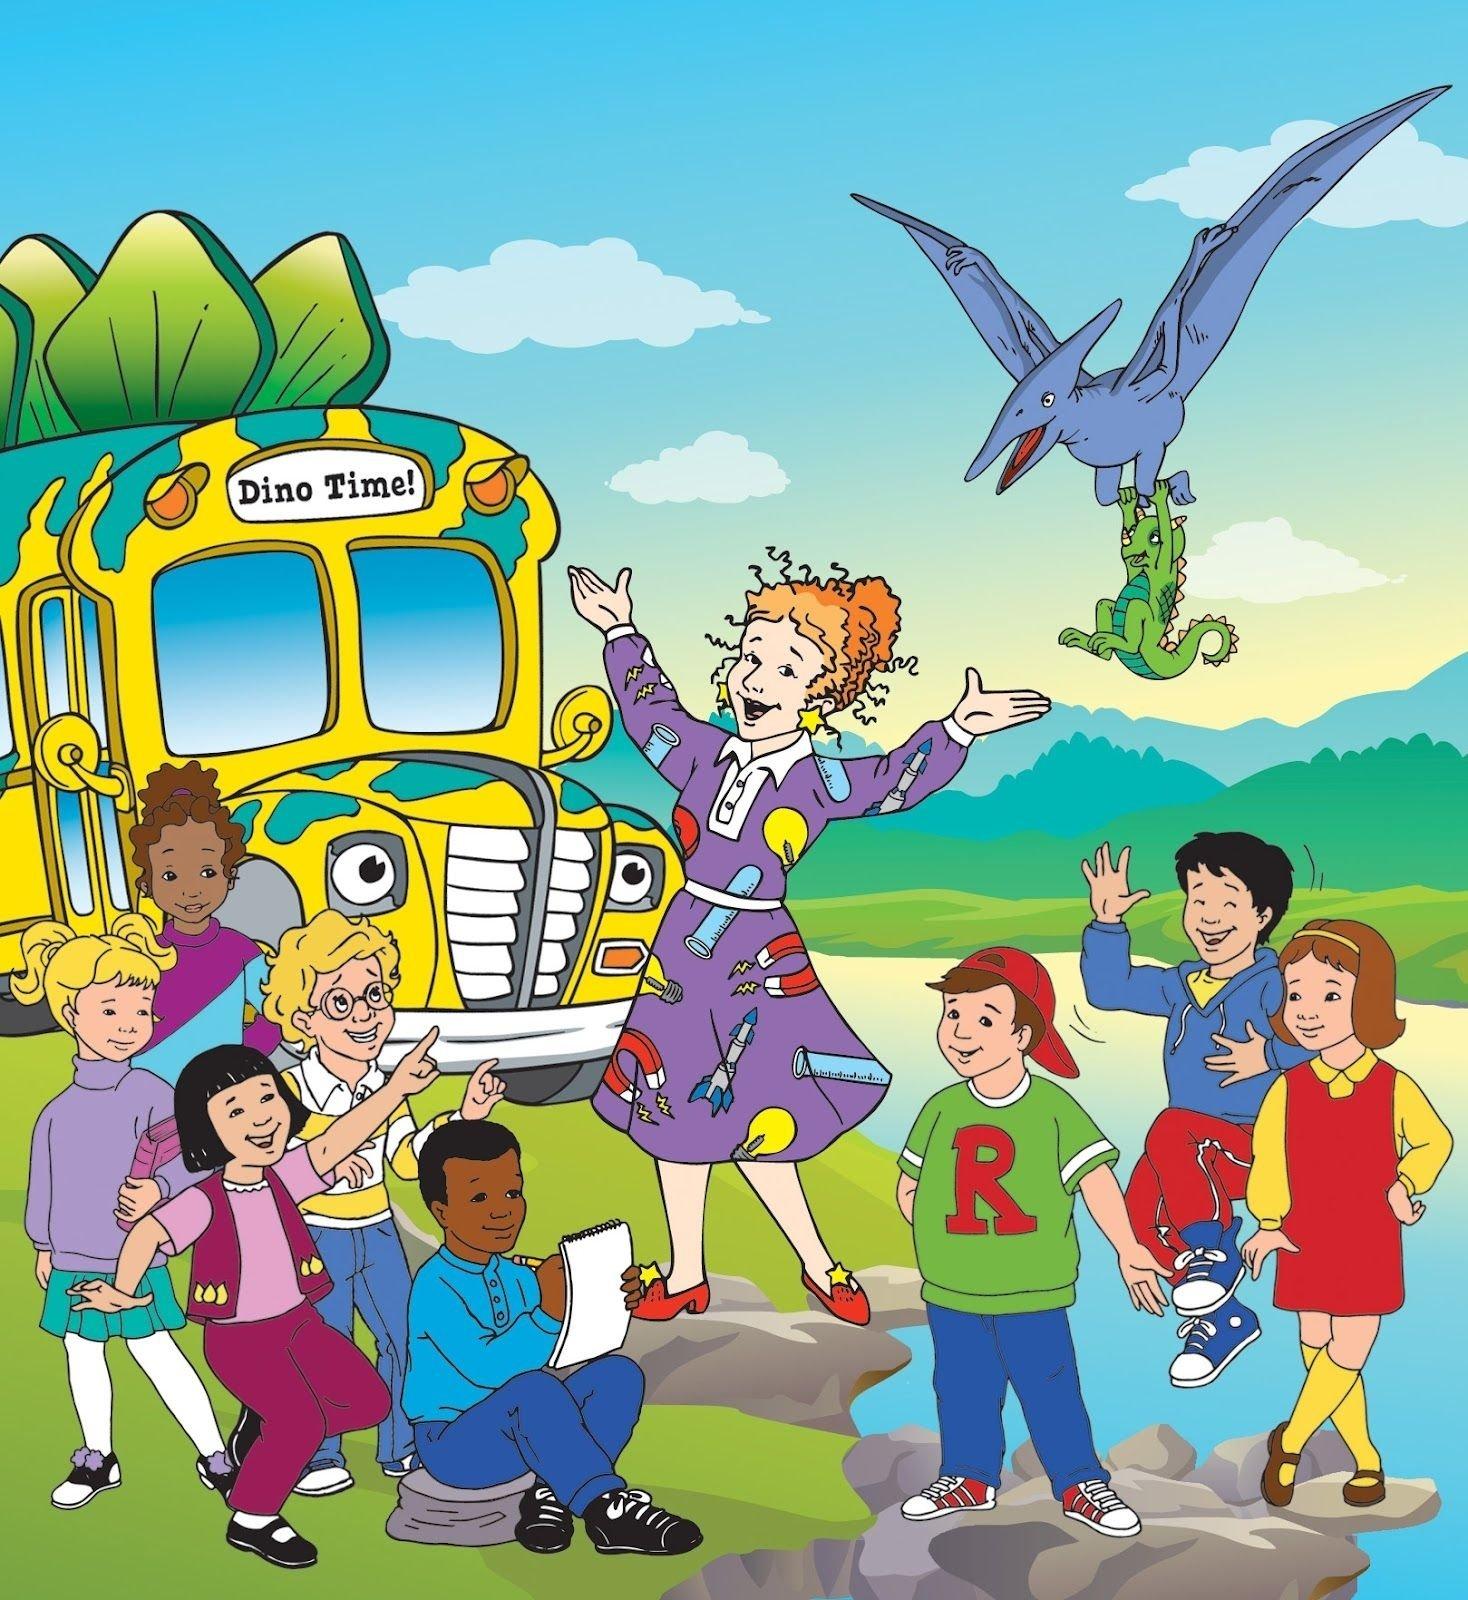 10 Ideal Magic School Bus Gets A Bright Idea netflix and scholastic team up to reboot the magic school bus